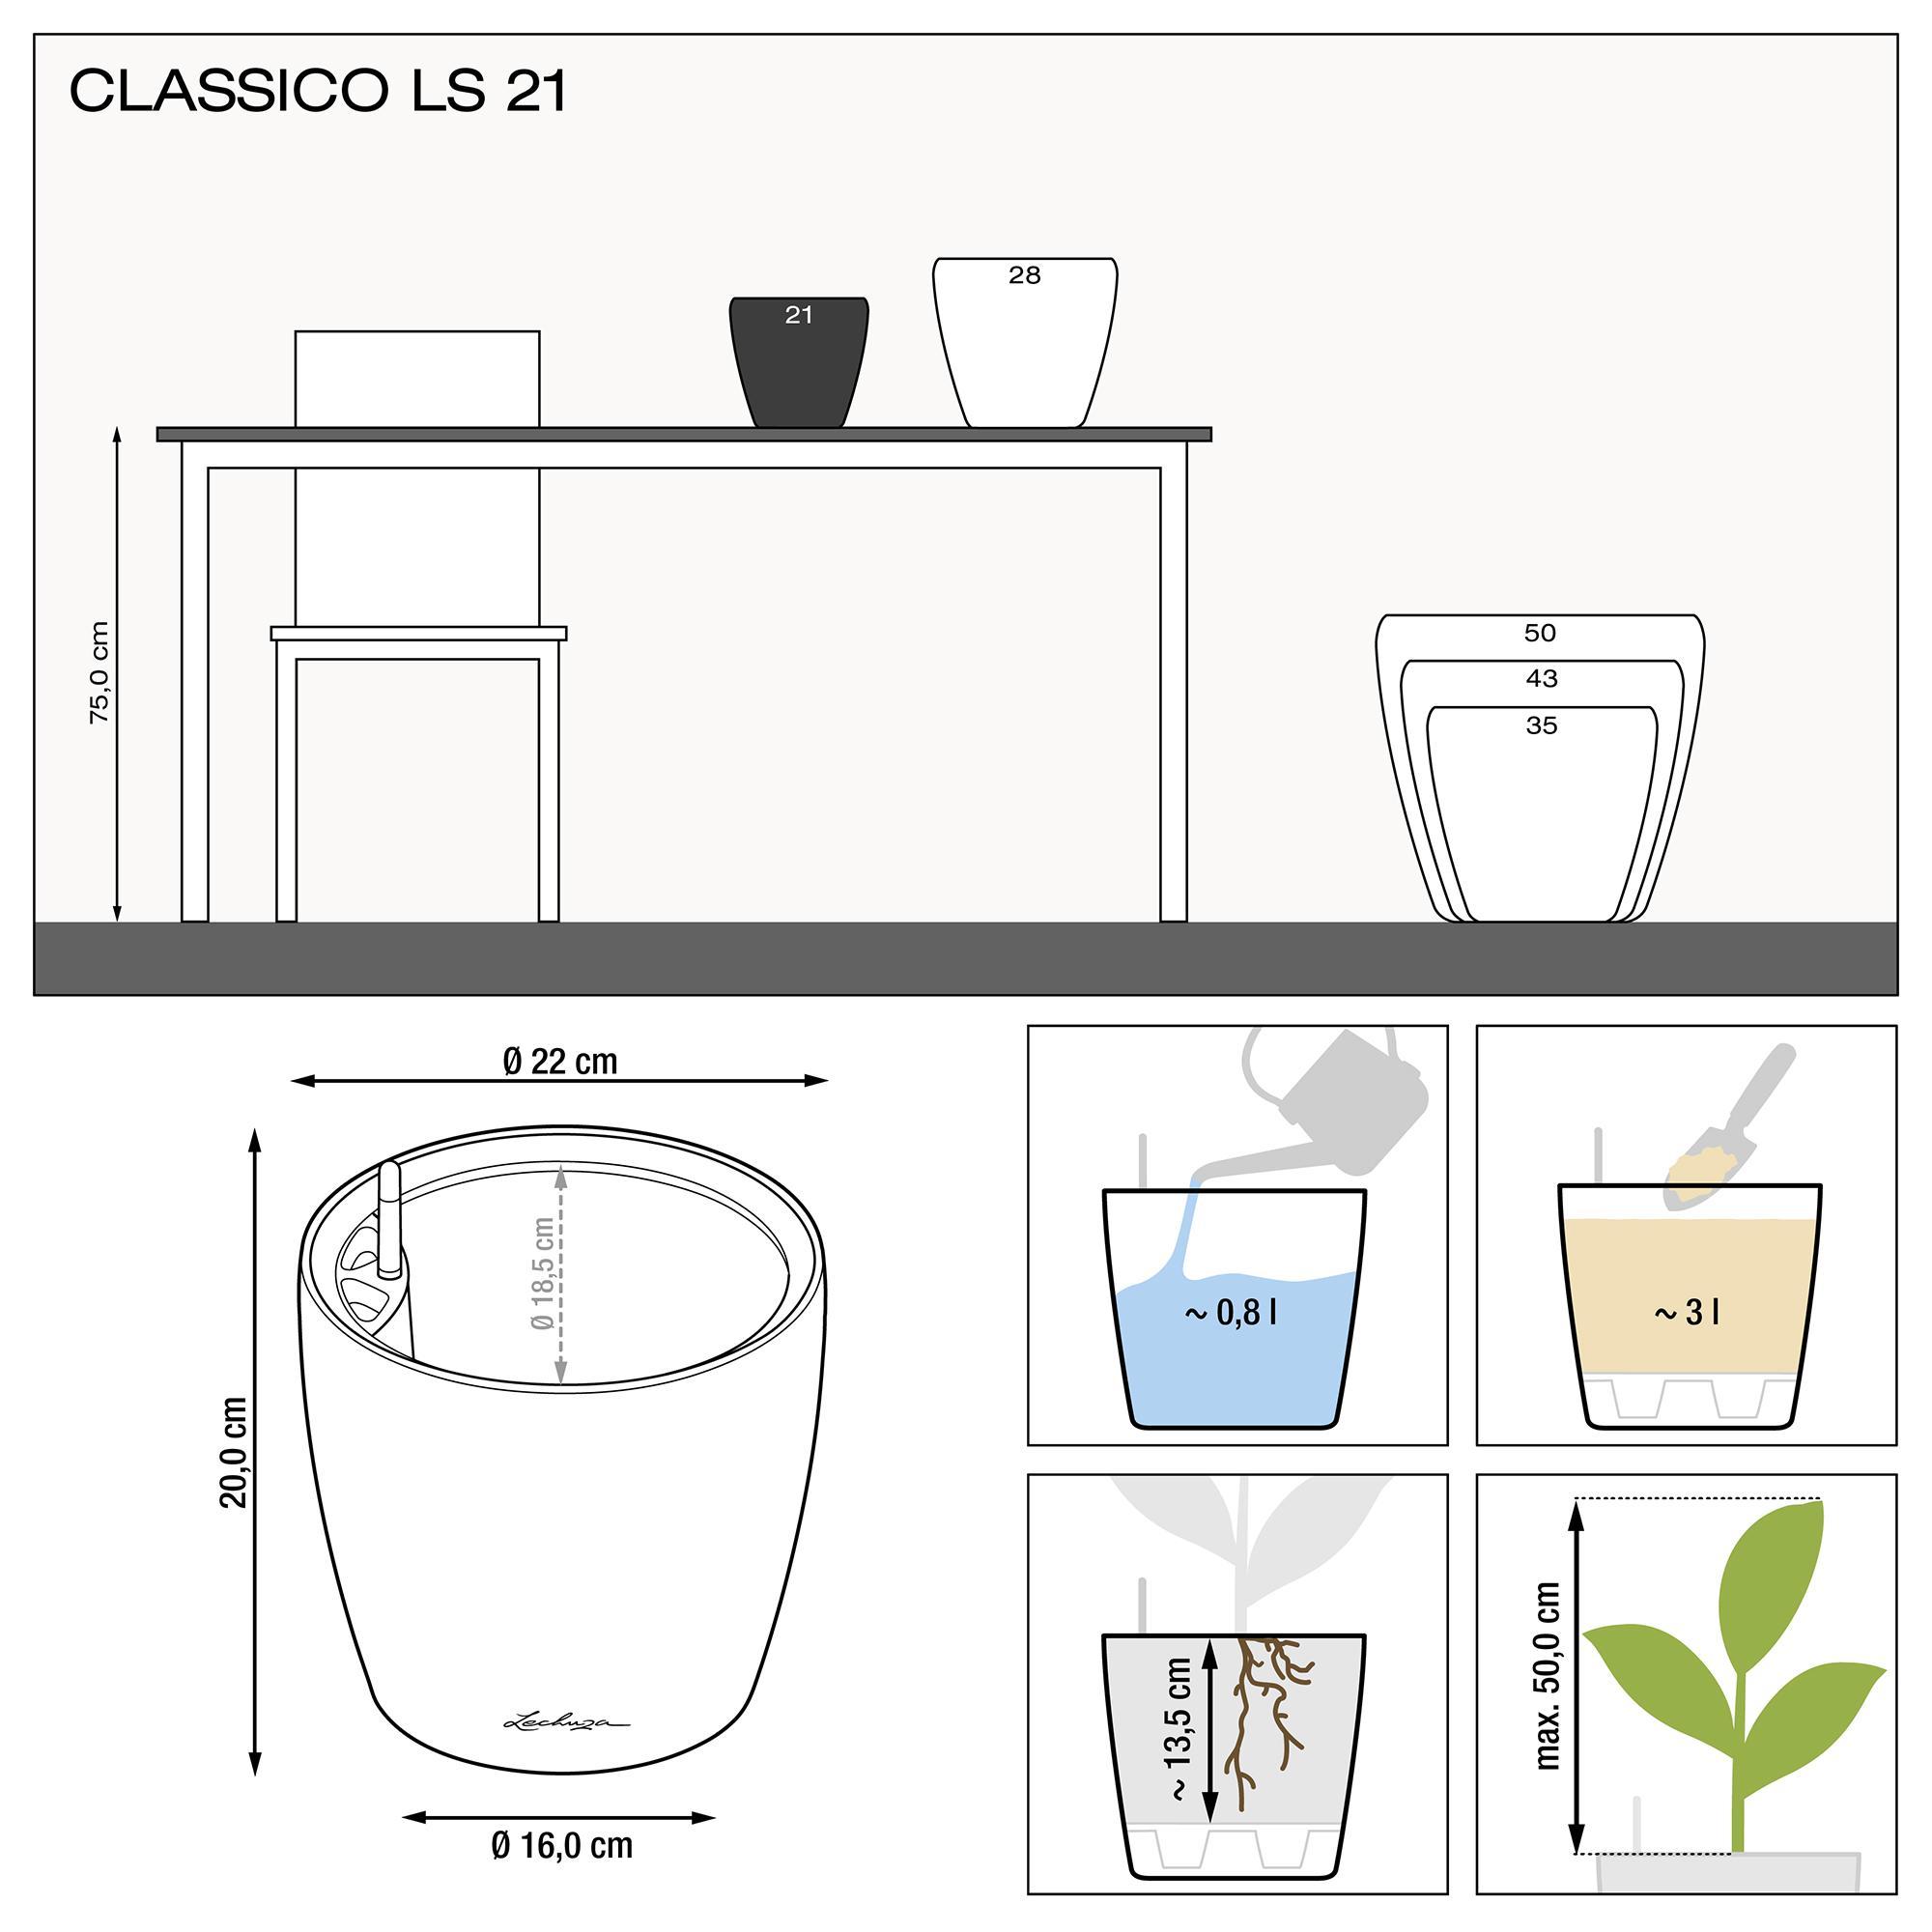 CLASSICO LS 21 shiny taupe - Image 3